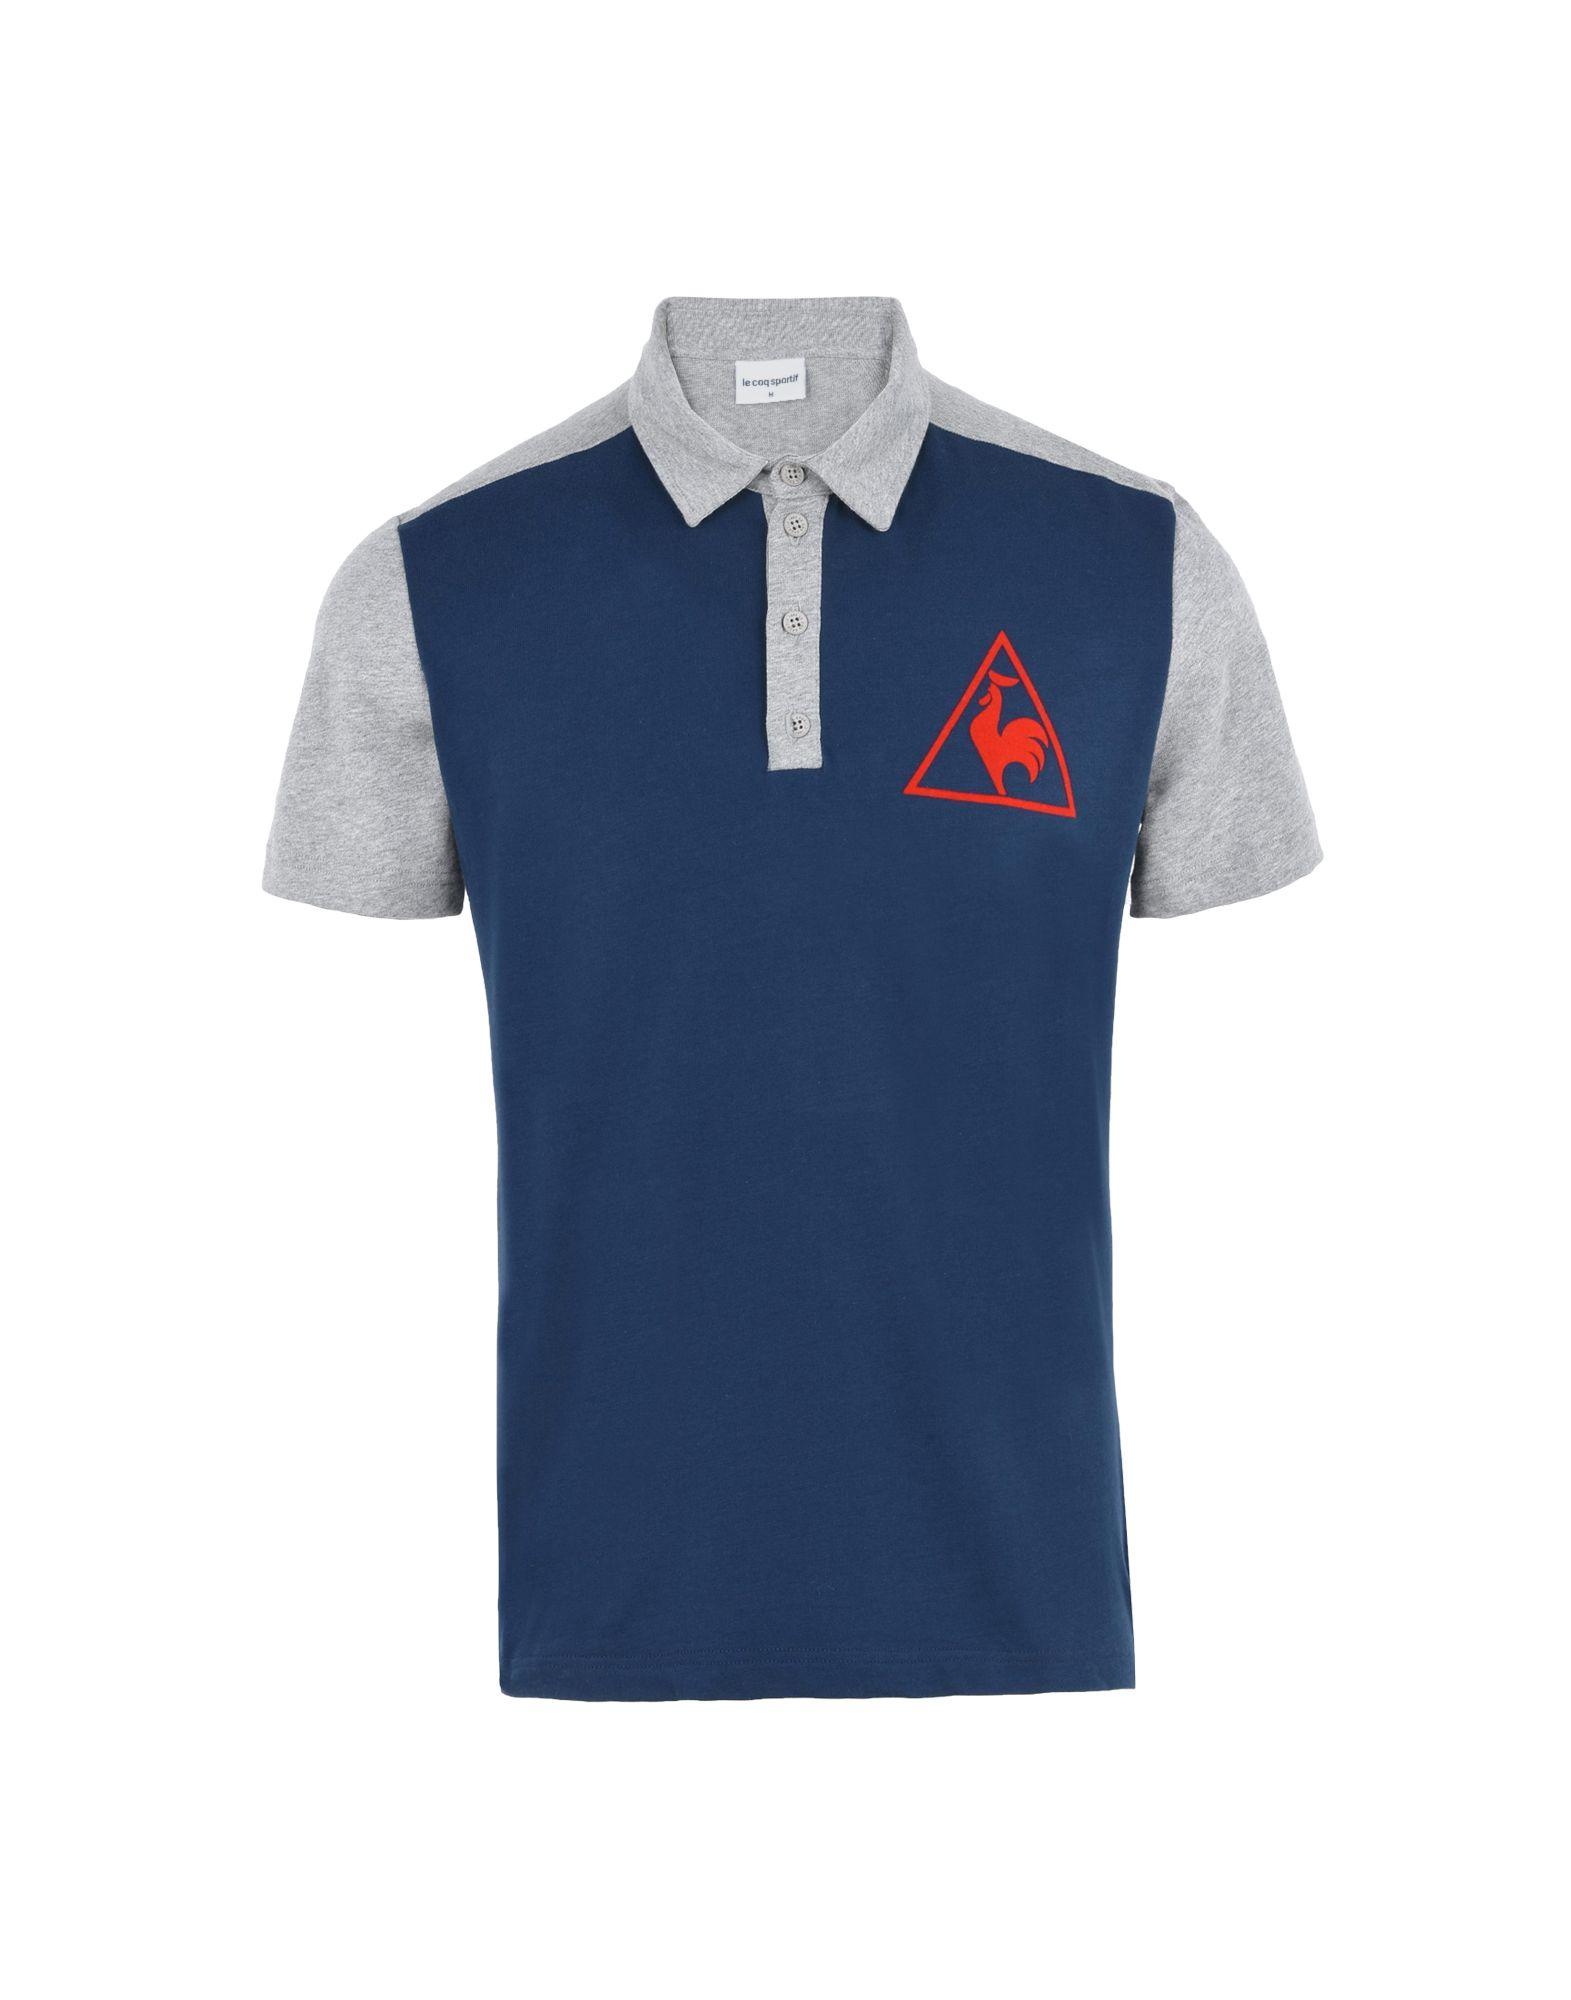 T-Shirt Sportiva Le Coq Coq Coq Sportif Tri Lf Tennis Polo Ss M - uomo - 12088761MS 9e1